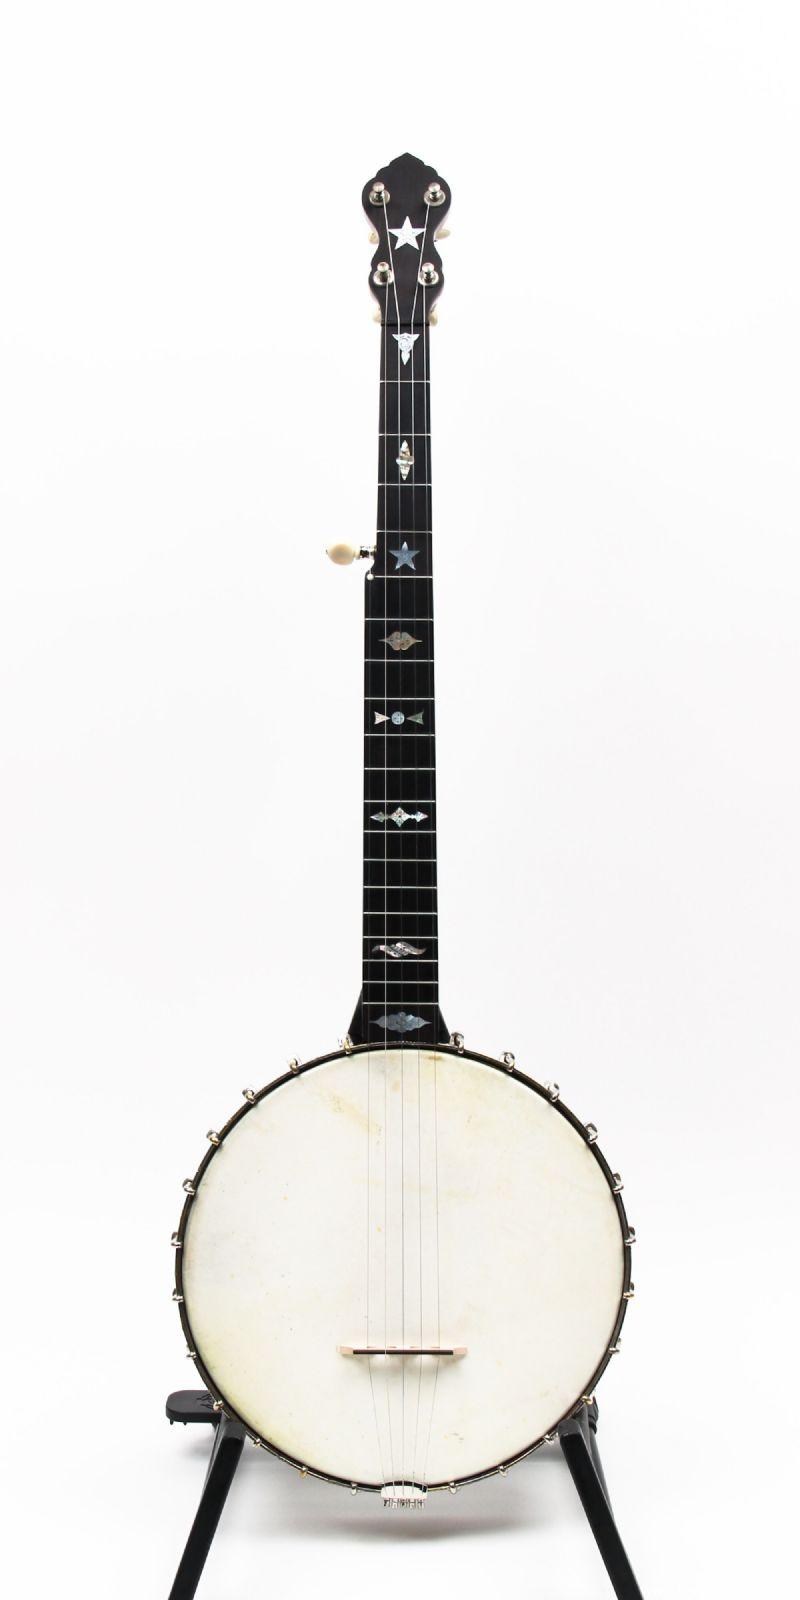 breakage-a-a-farland-black-beauty-banjo-amber-video